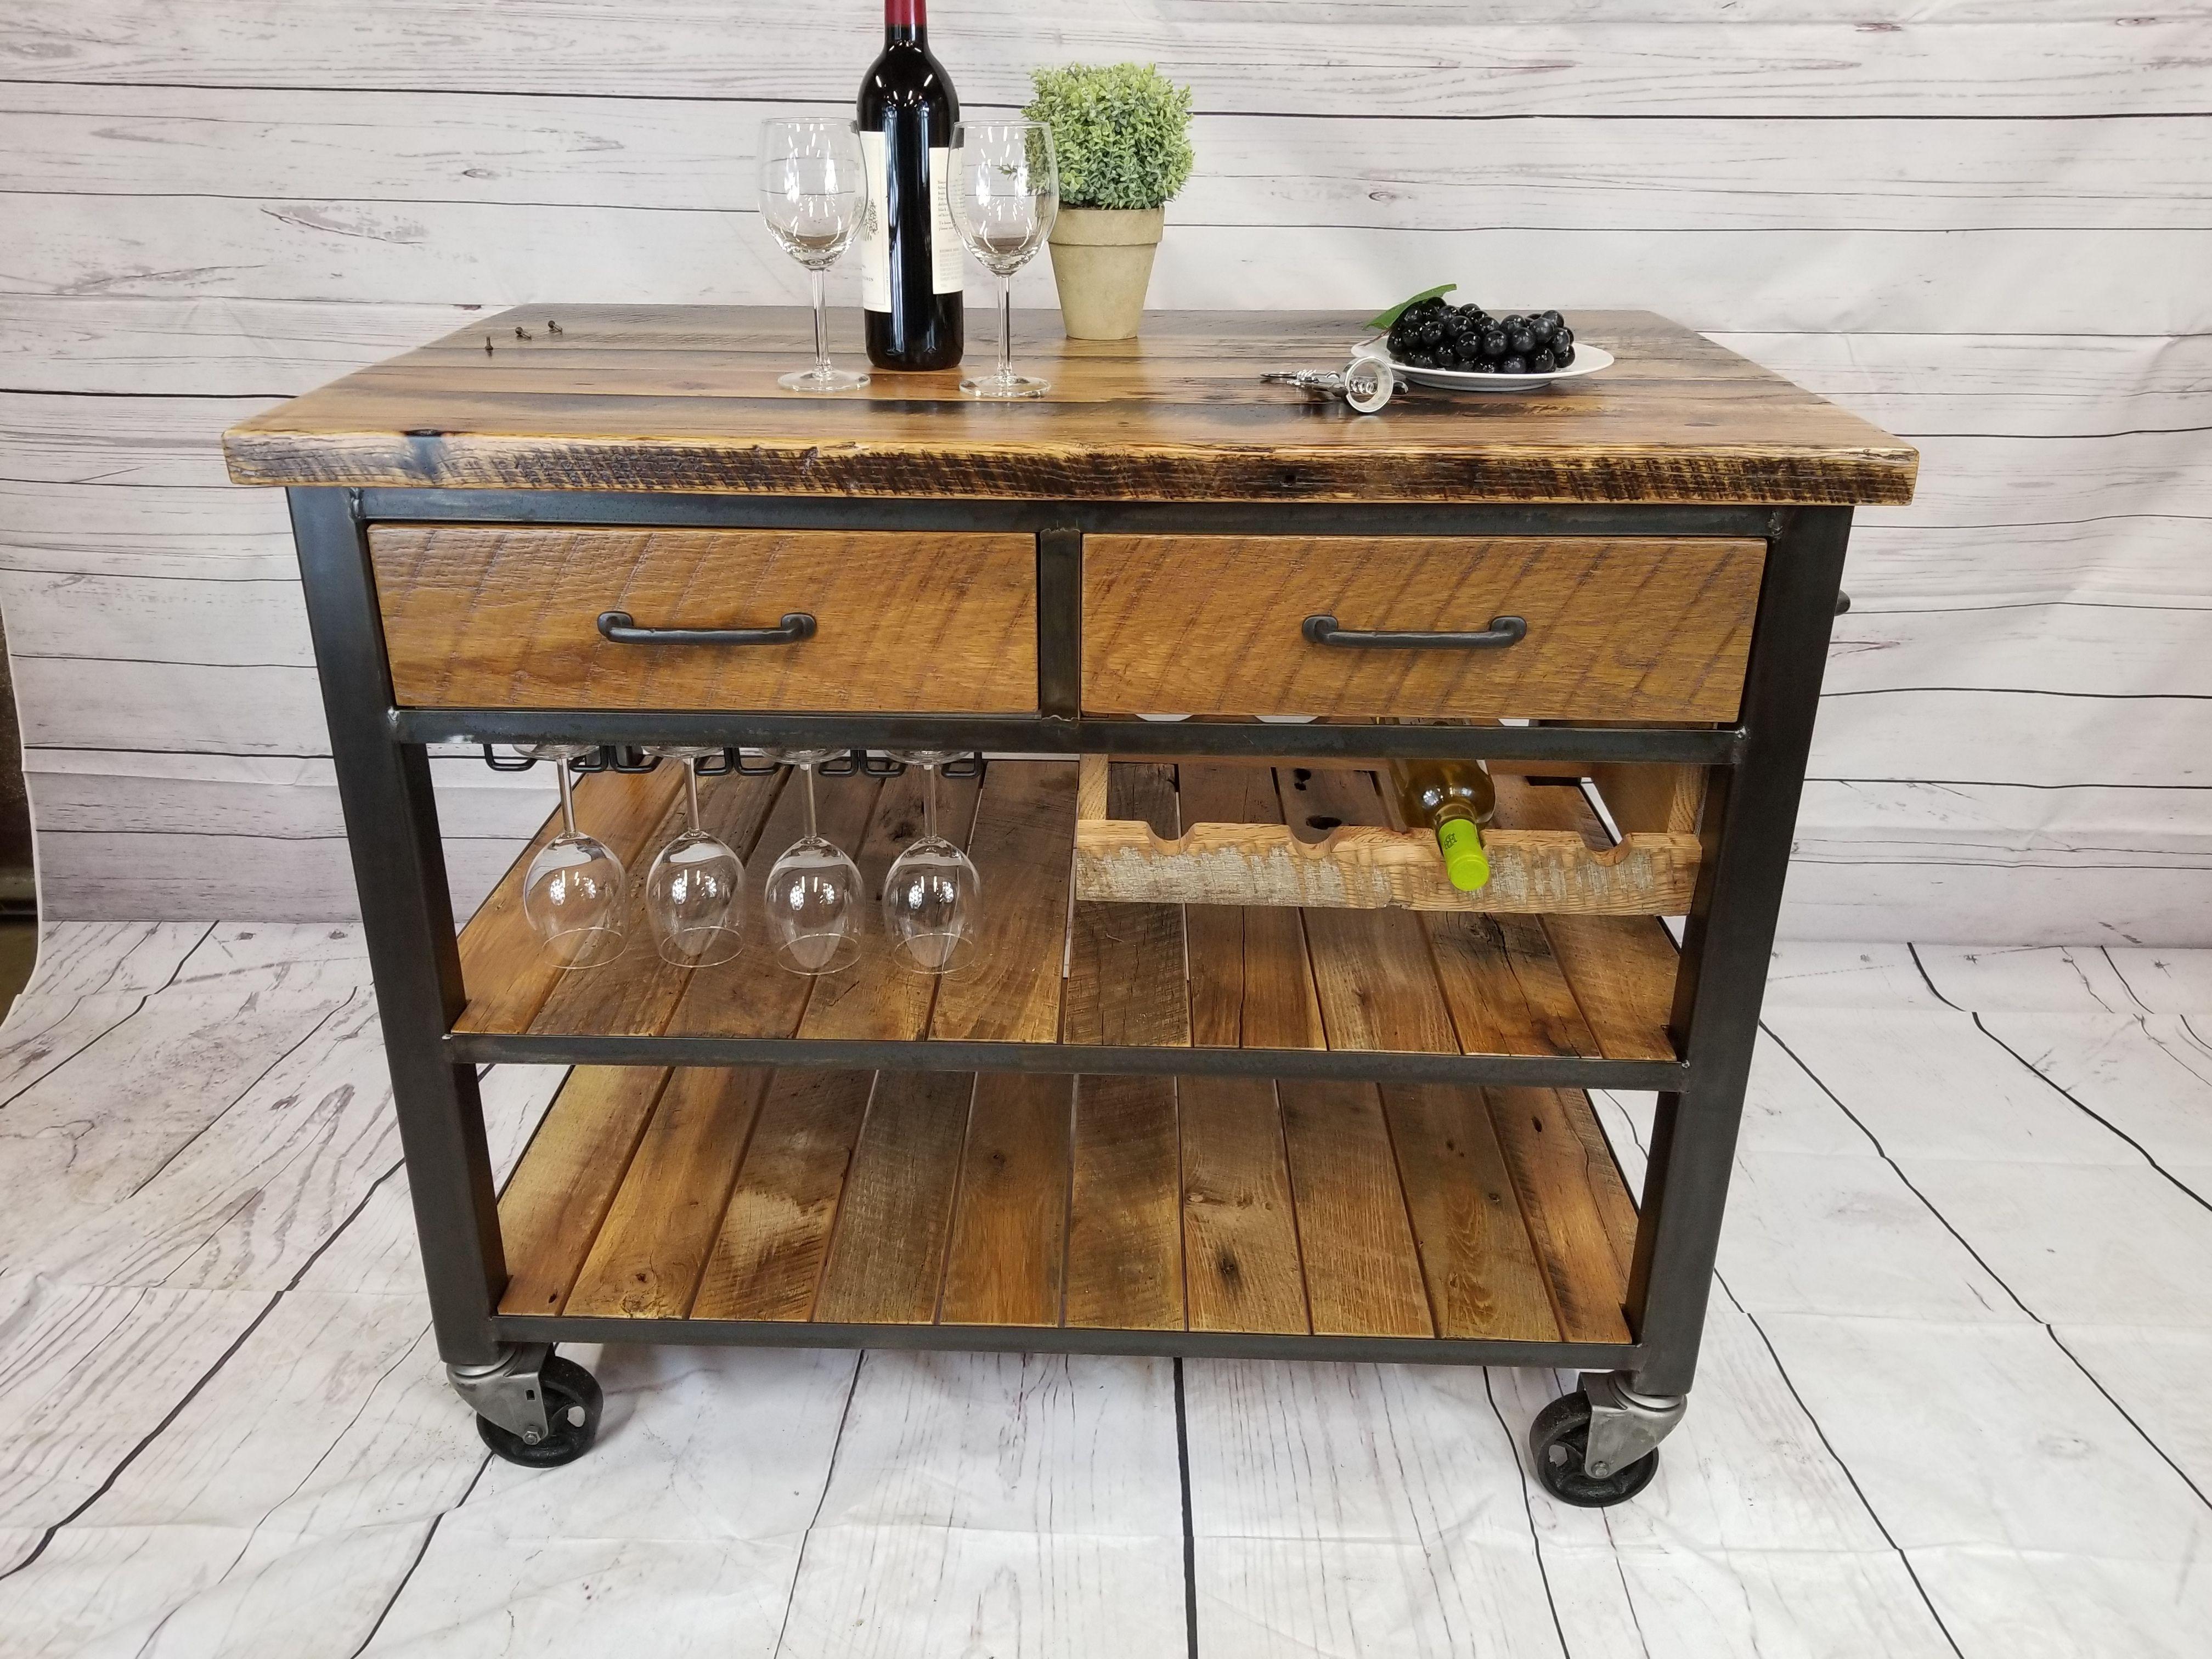 Buy a Custom Reclaimed Wood Bar Cart, Rustic Kitchen Island ...